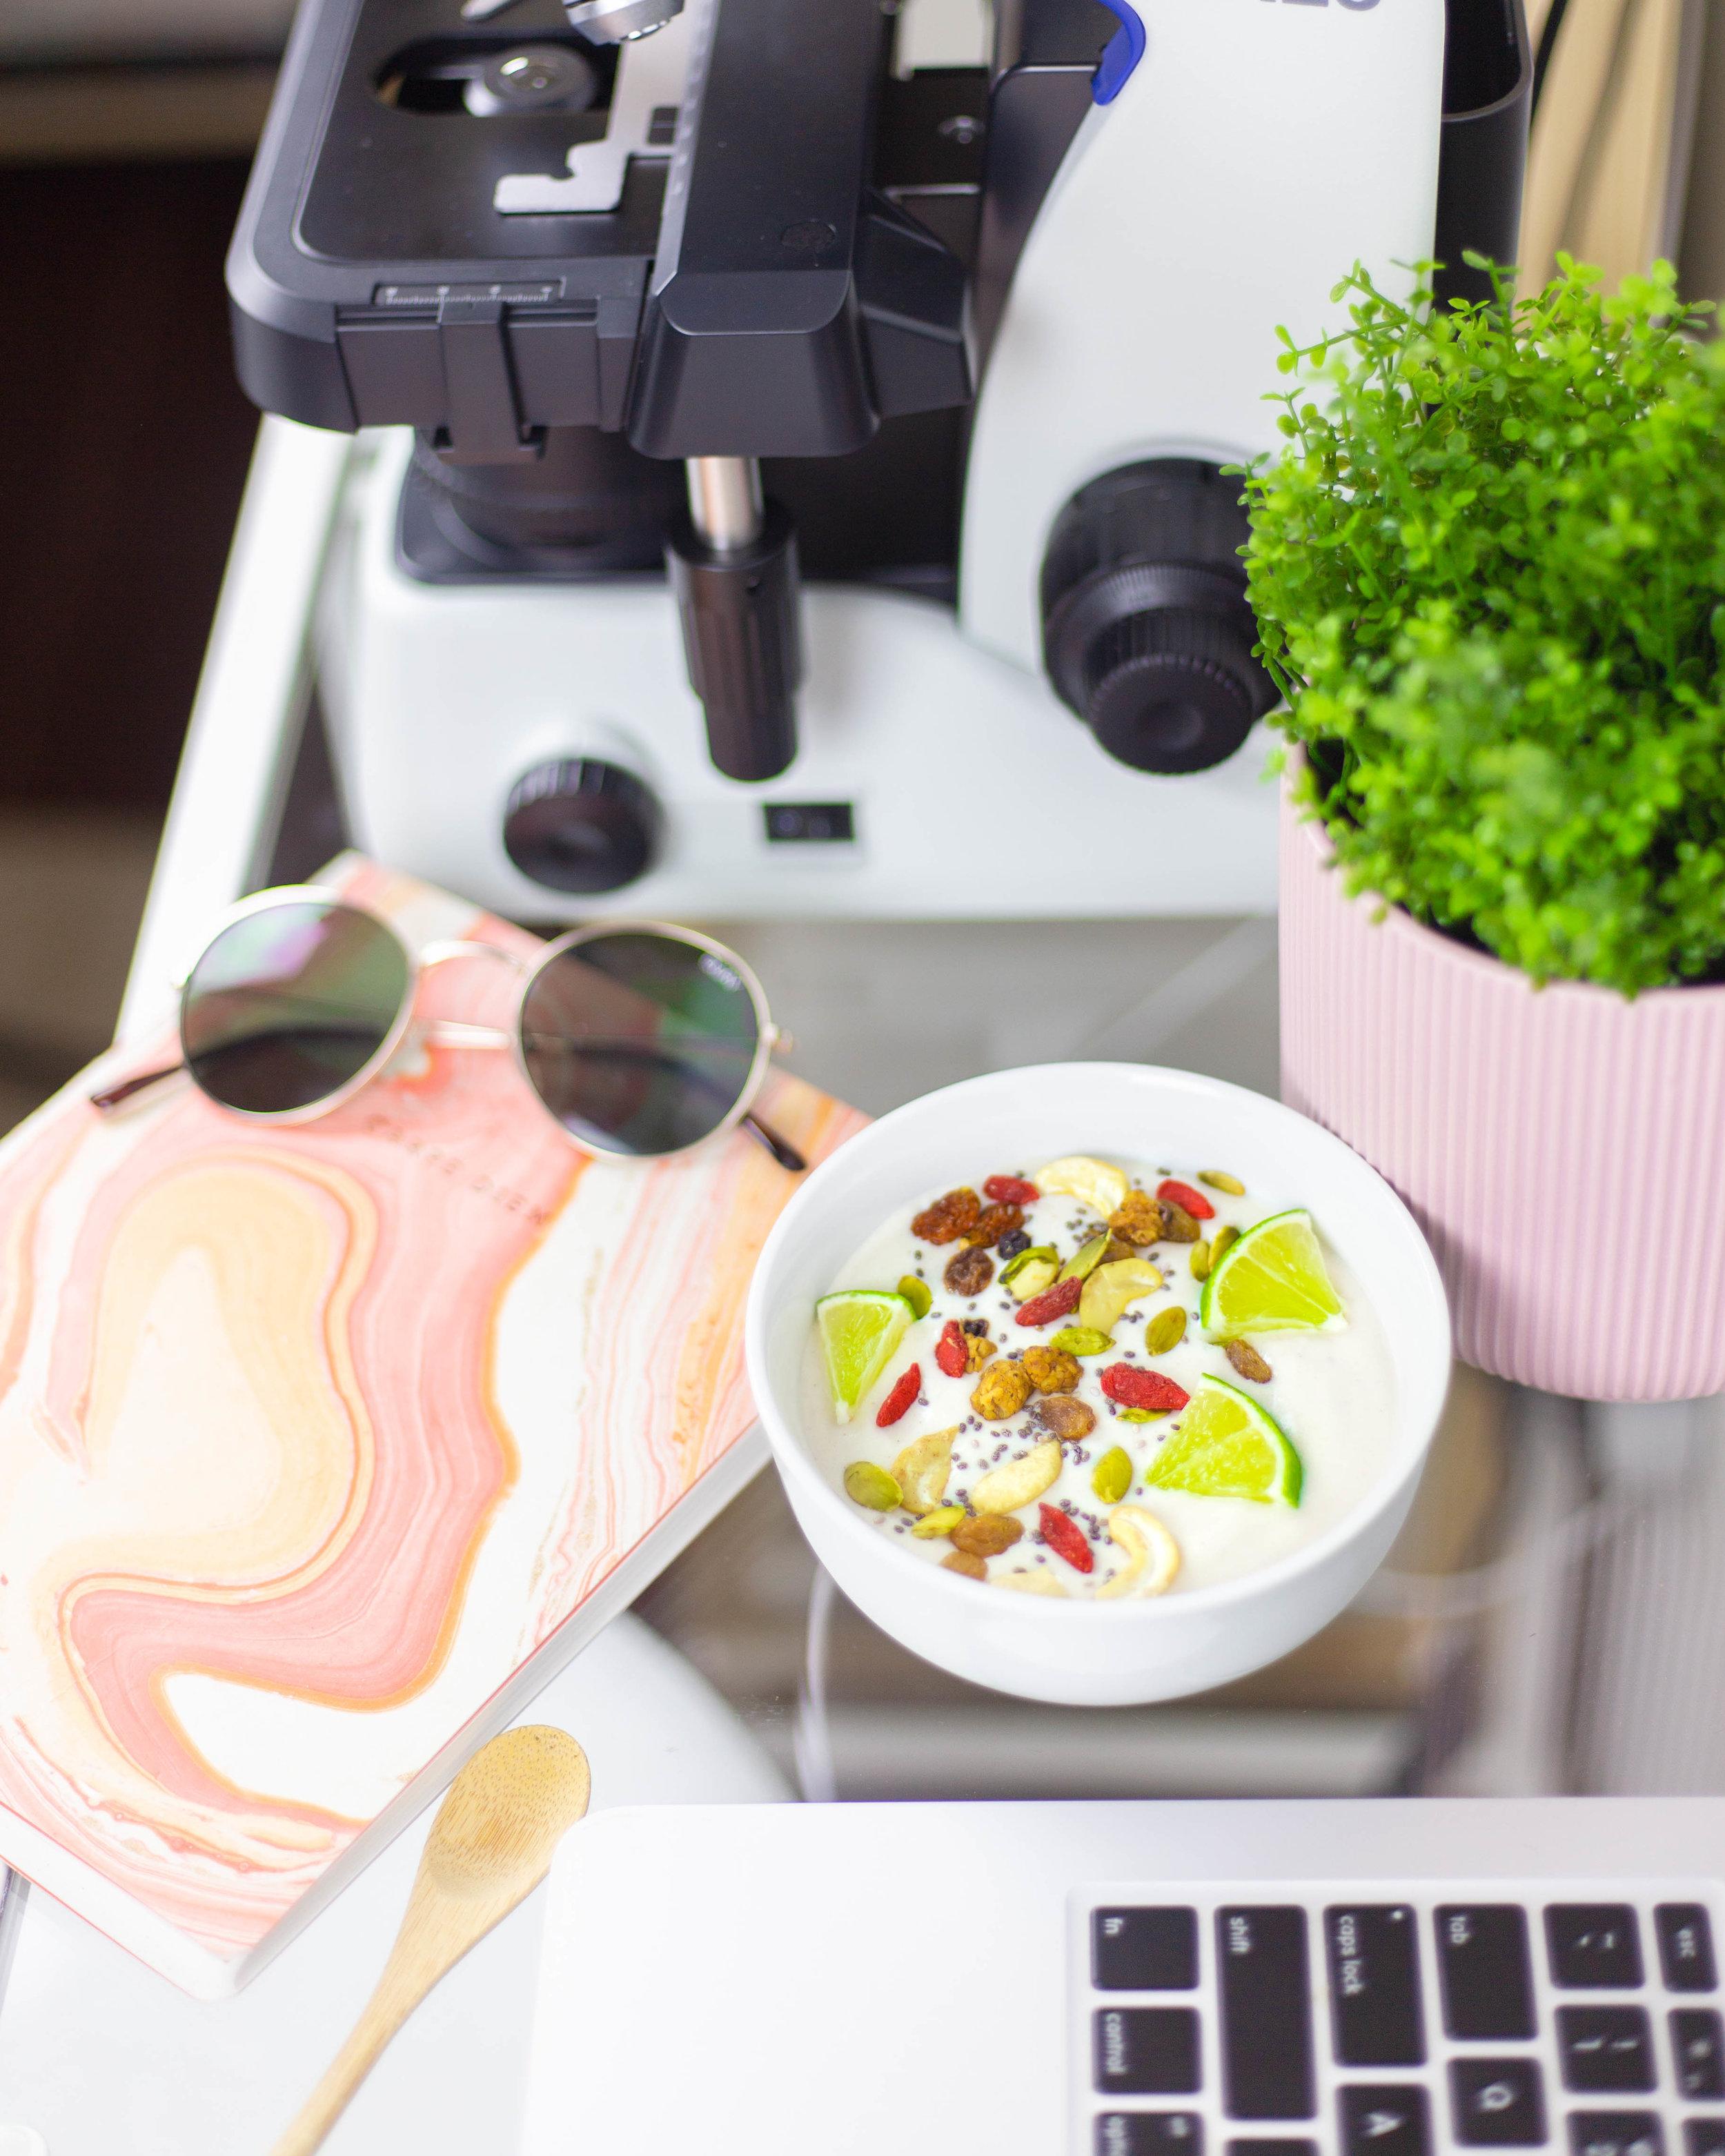 How to Make Creamy and Thick Vegan Yogurt Using Plant Based Milks   Plant Based Yogurt   Dairy Free and Probiotic Yogurt Recipe